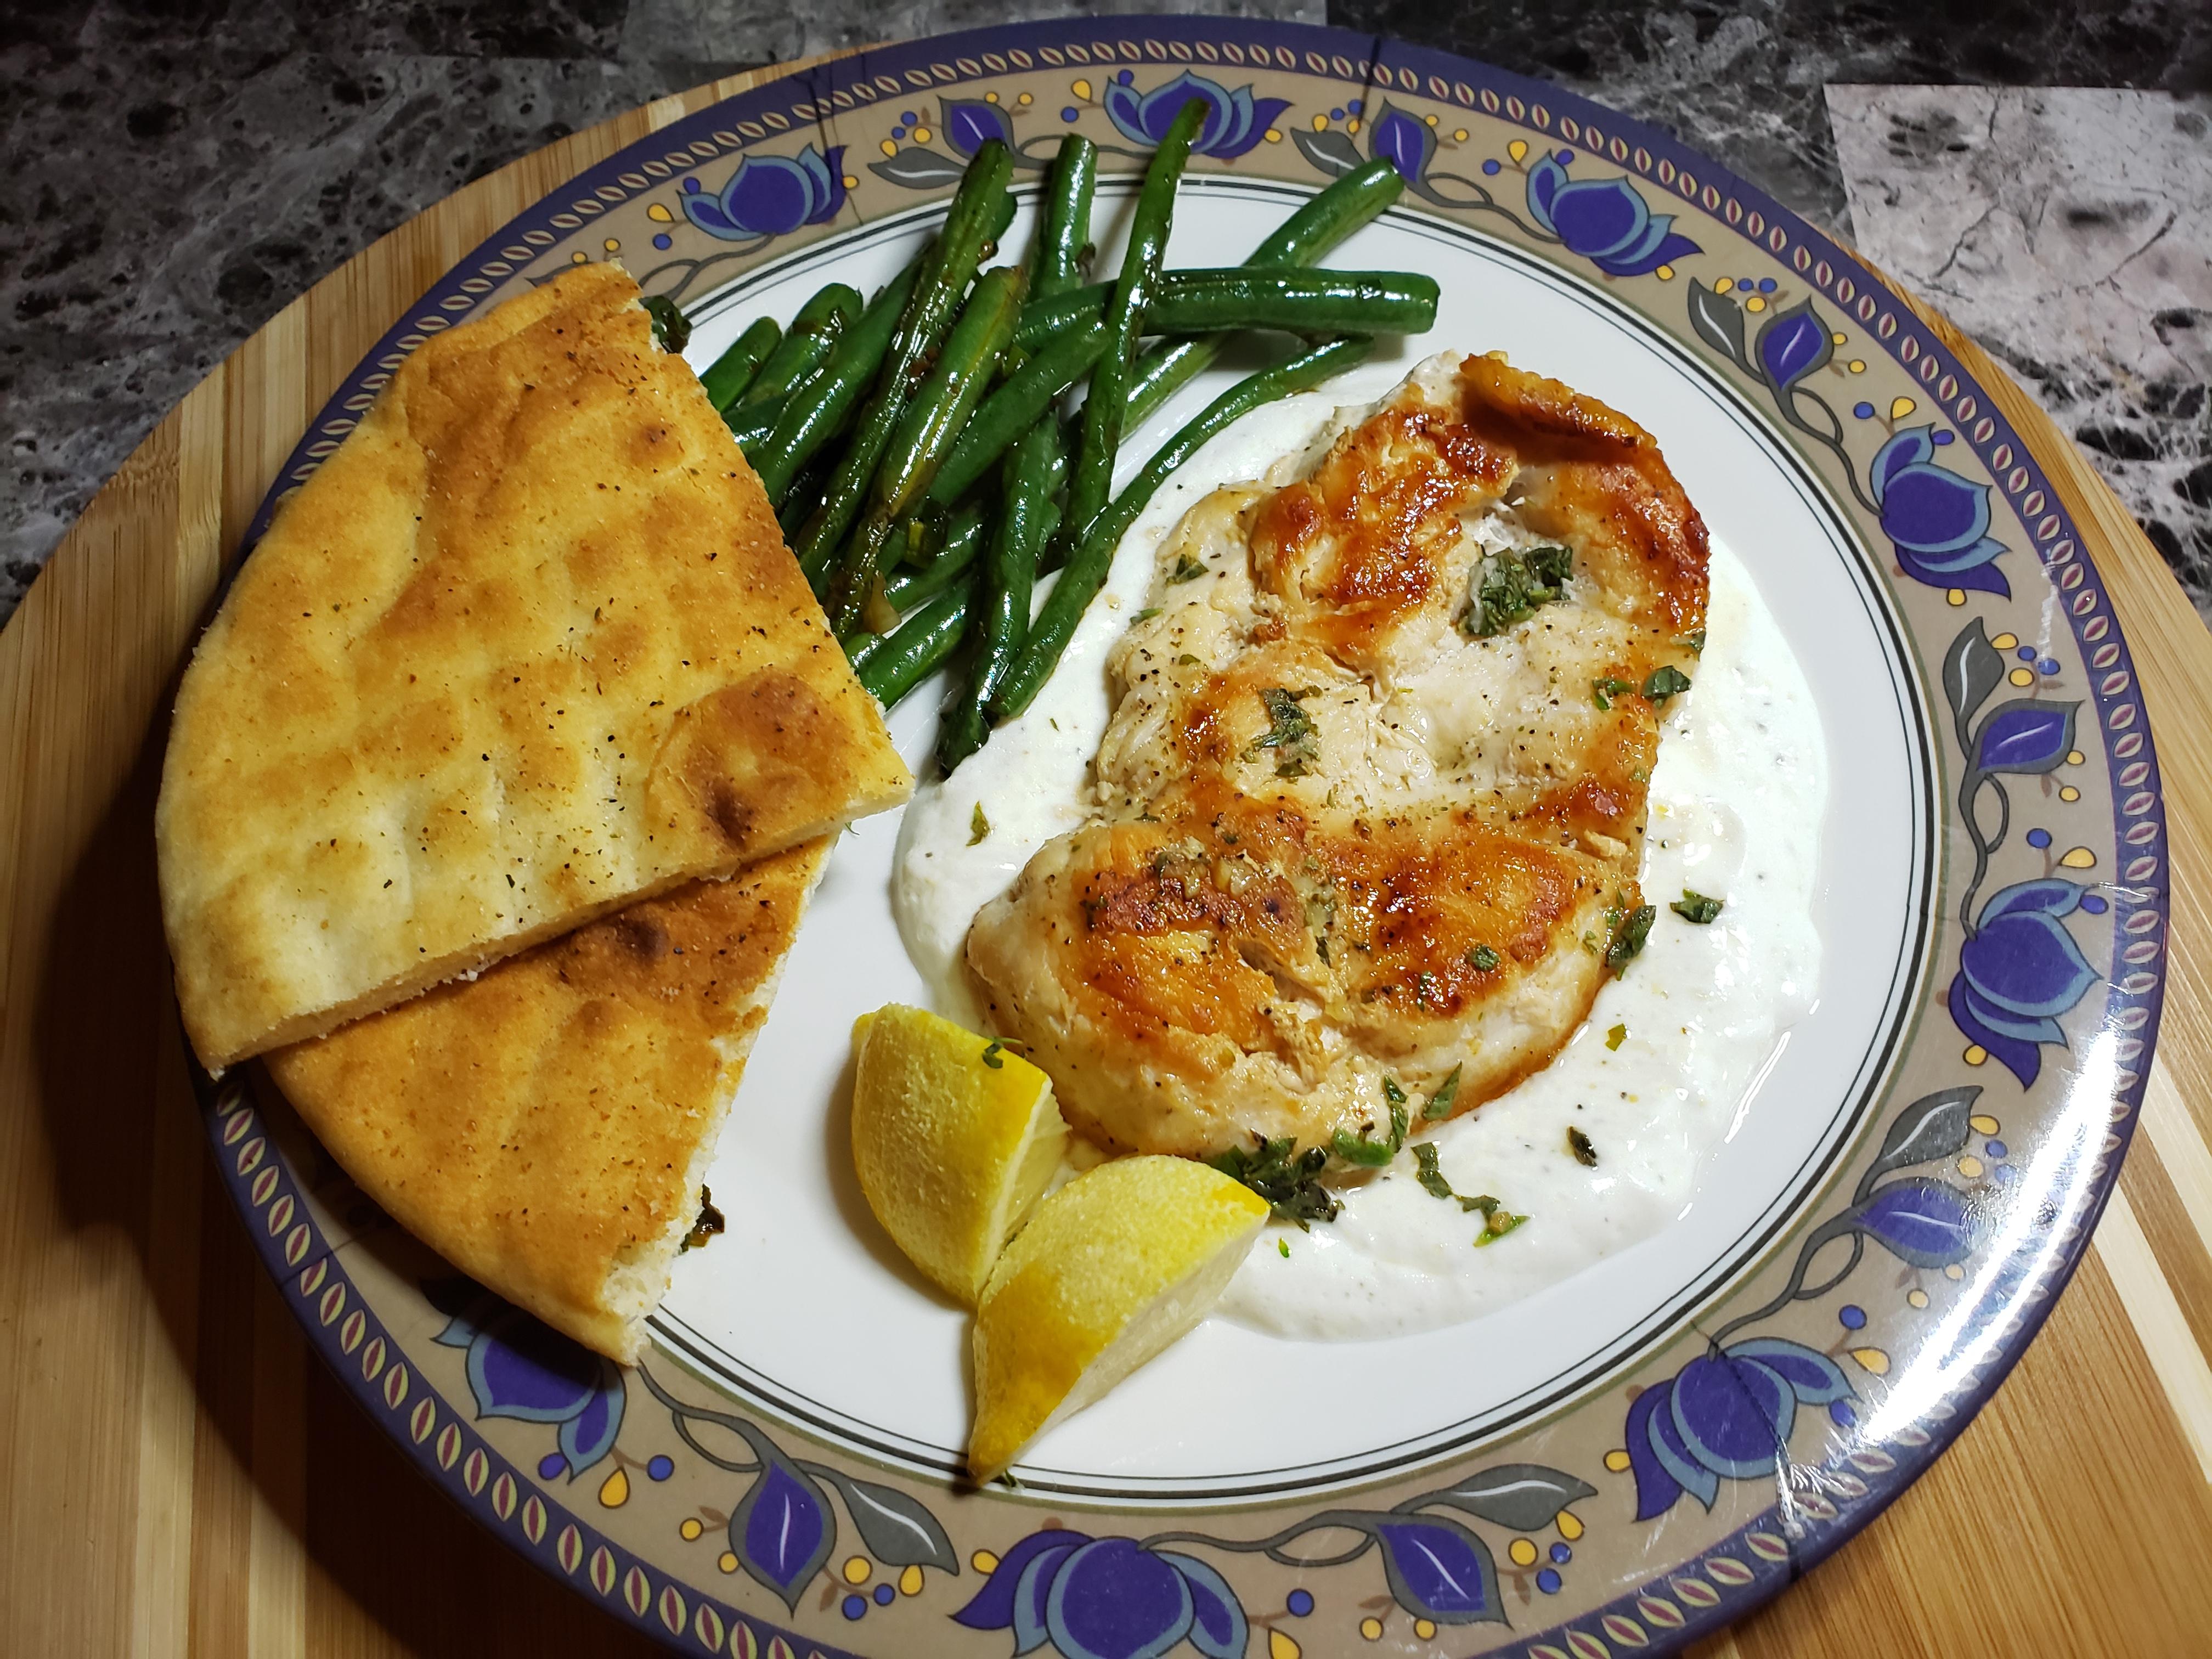 Lemon Herb Chicken Recipe with Garlicky Yogurt